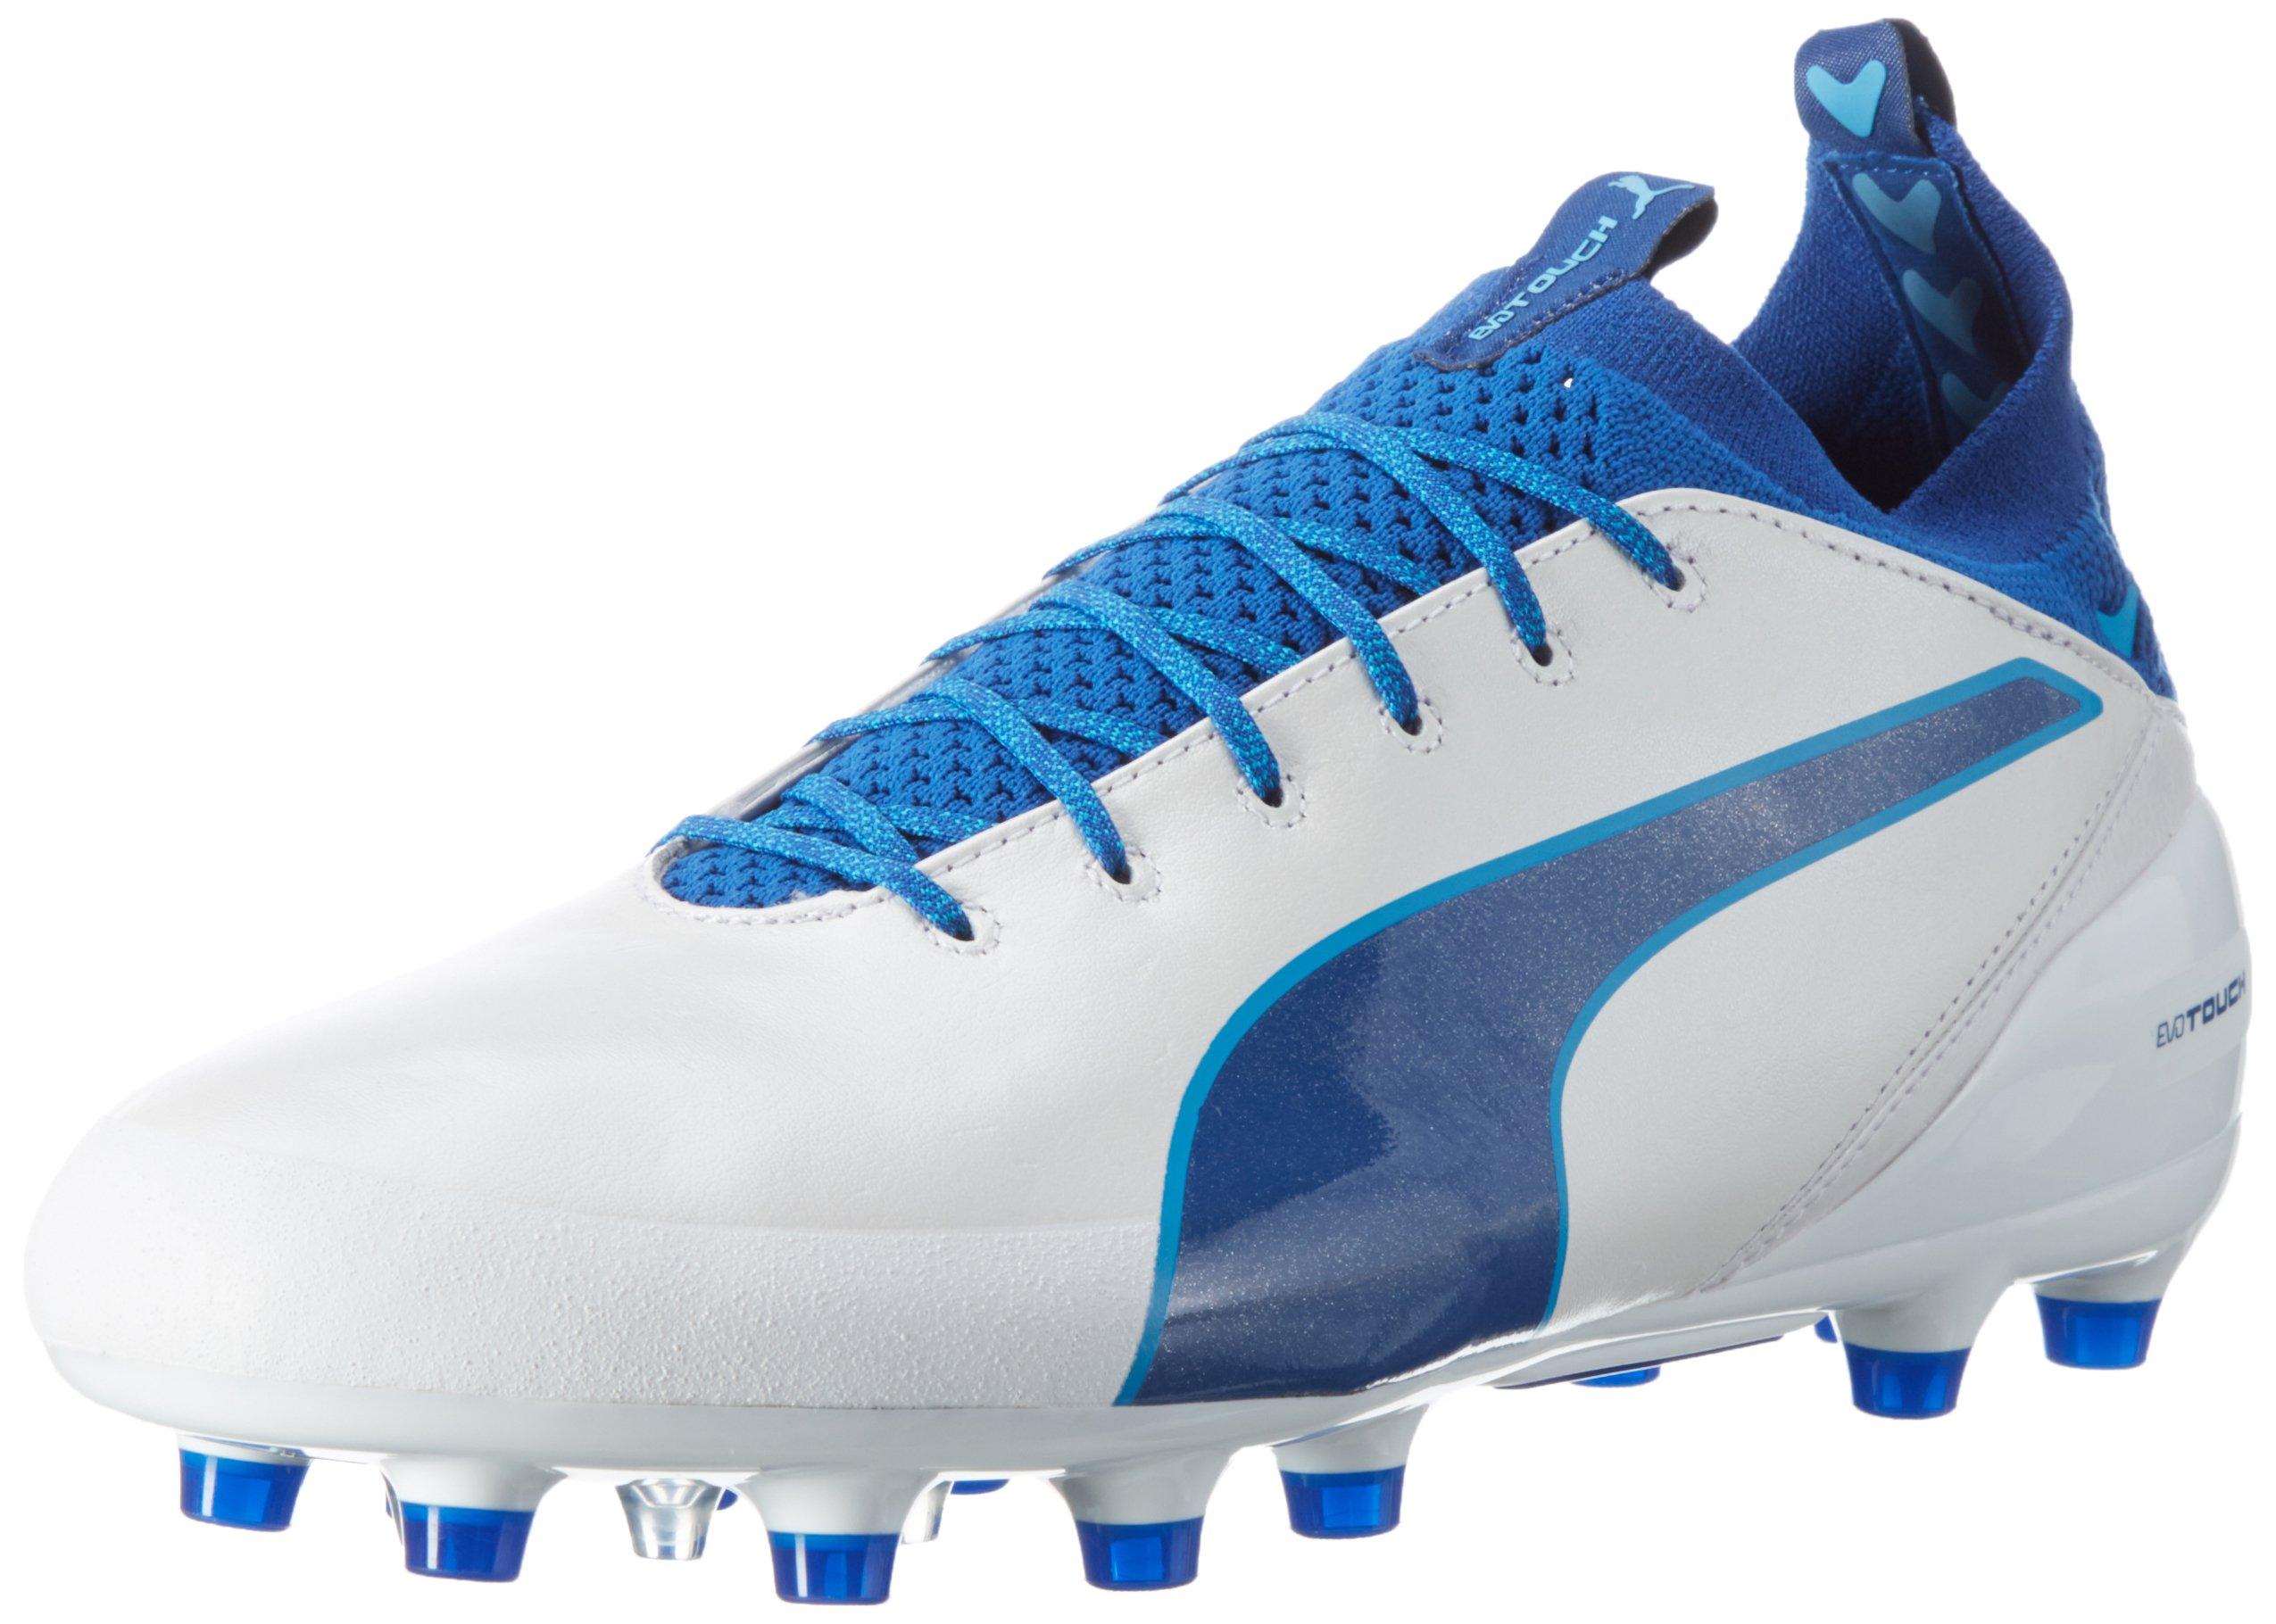 Eu Football Pro Blue Puma true 0240 Evotouch De AgChaussures HommeBlanc White Danube zMVpUGLqS